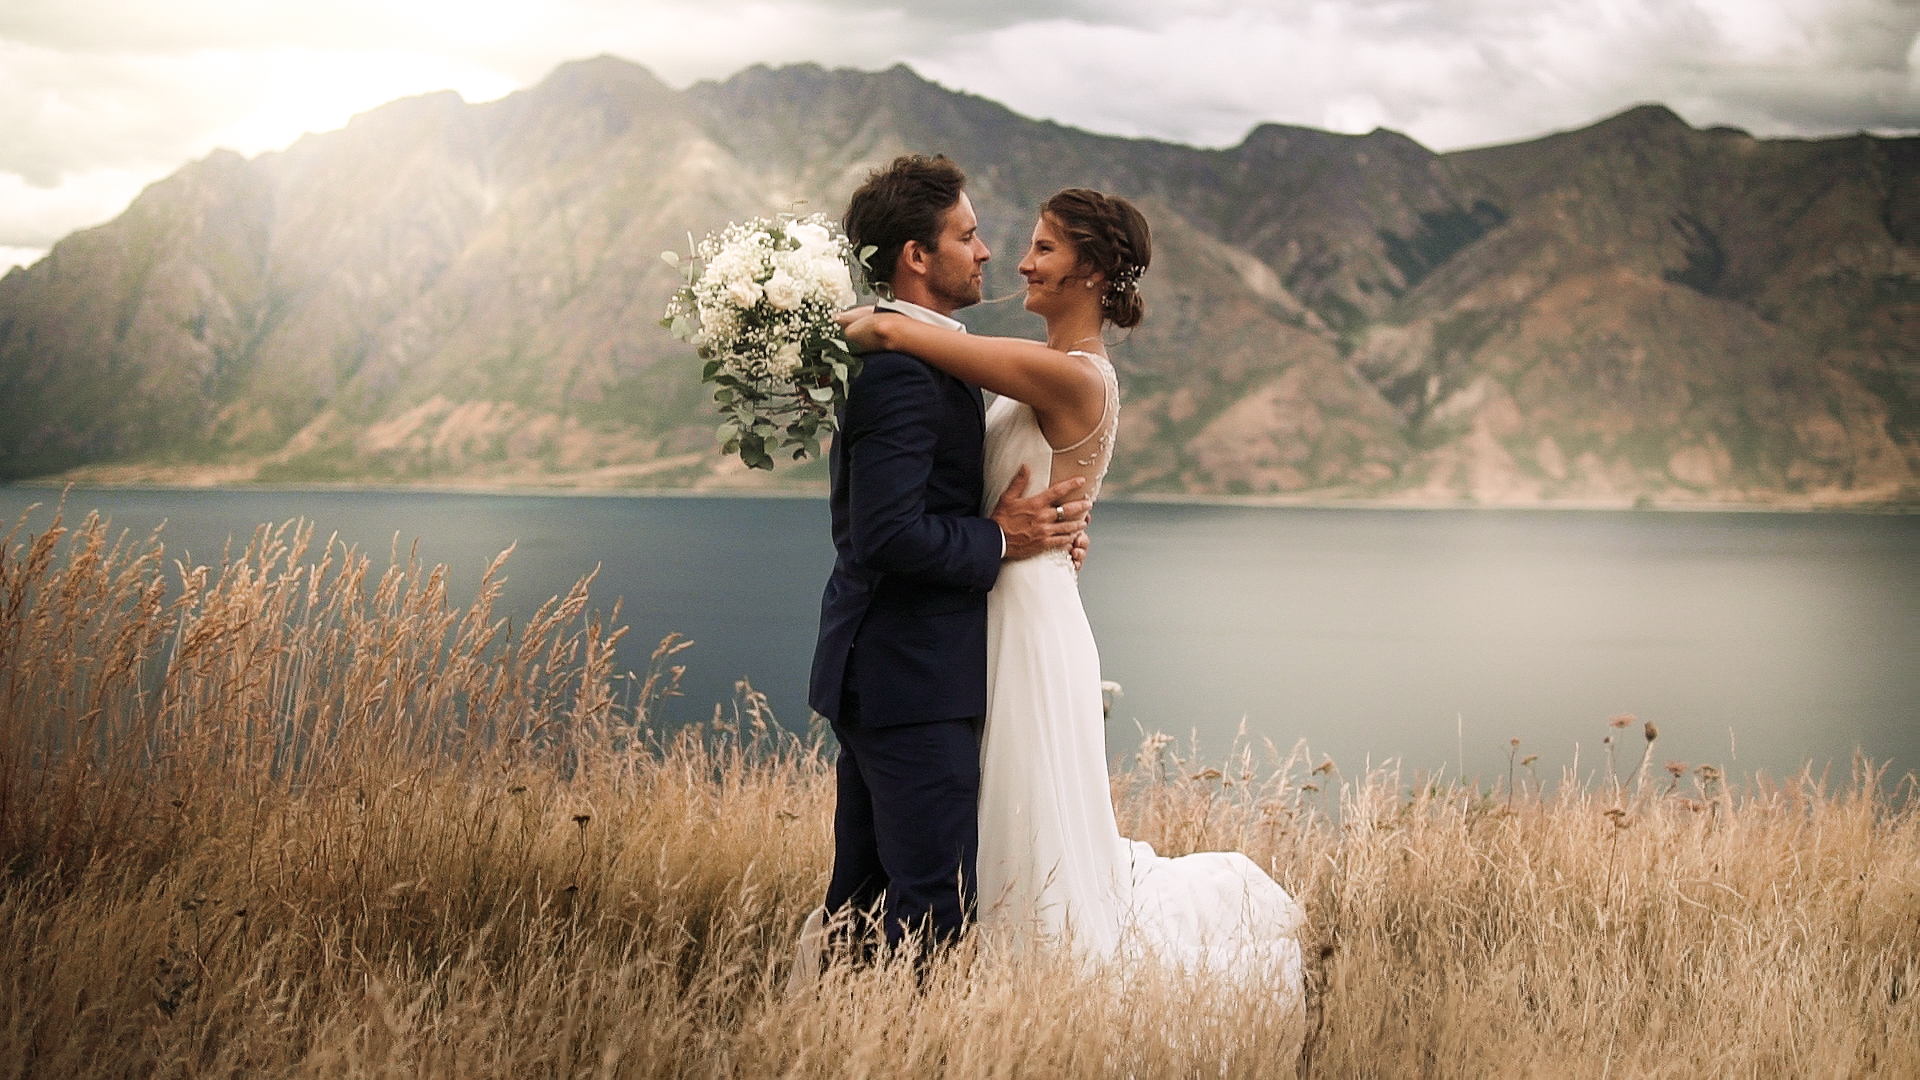 NZ Wedding Films - Ray and Tim - Wanaka 2.jpg